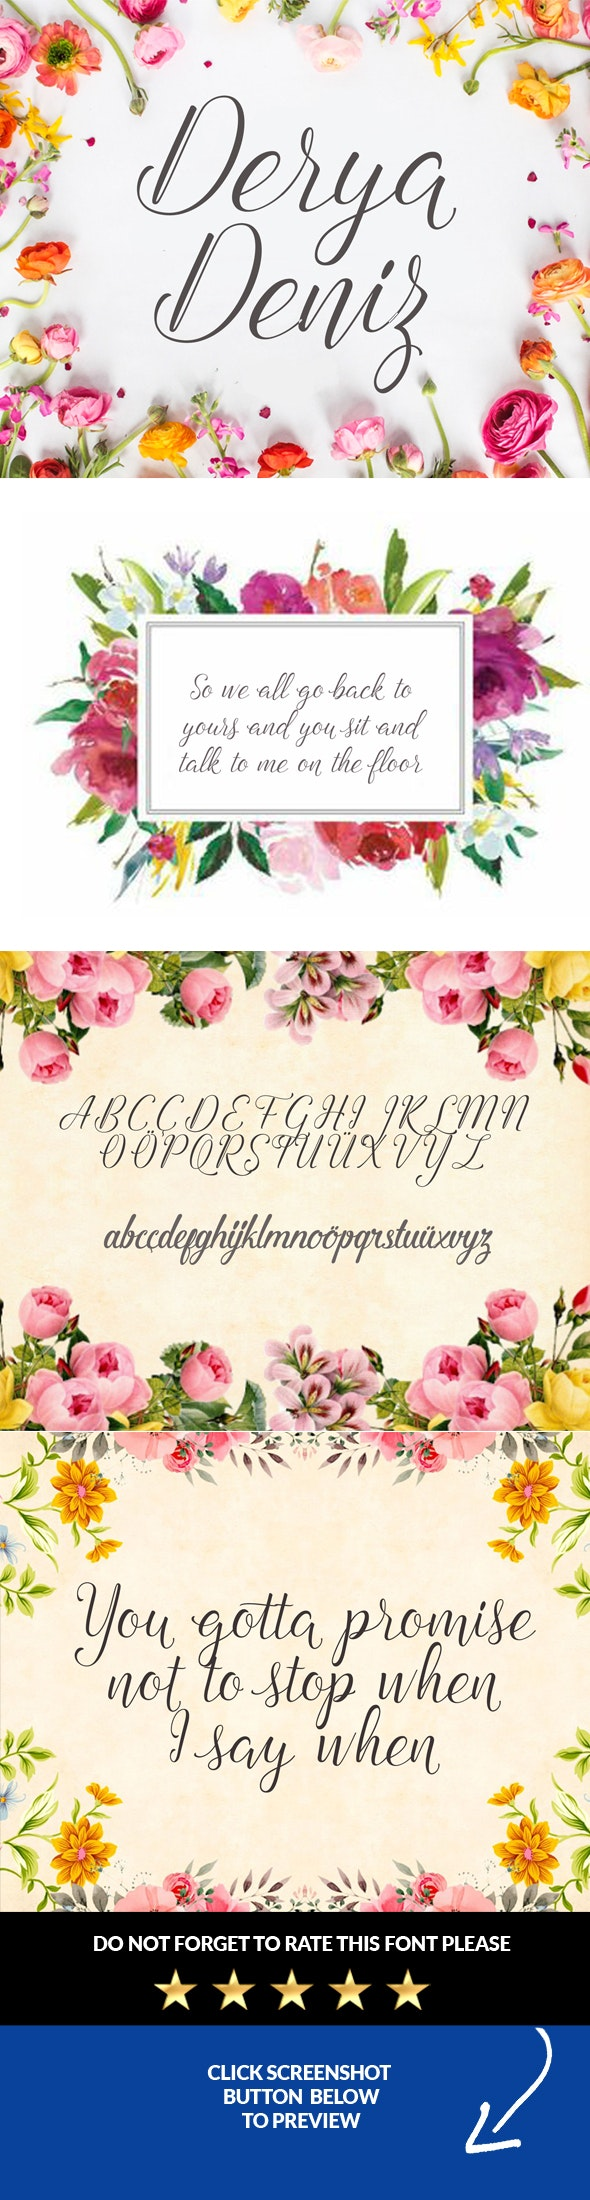 Deryadeniz Script Font - Calligraphy Script